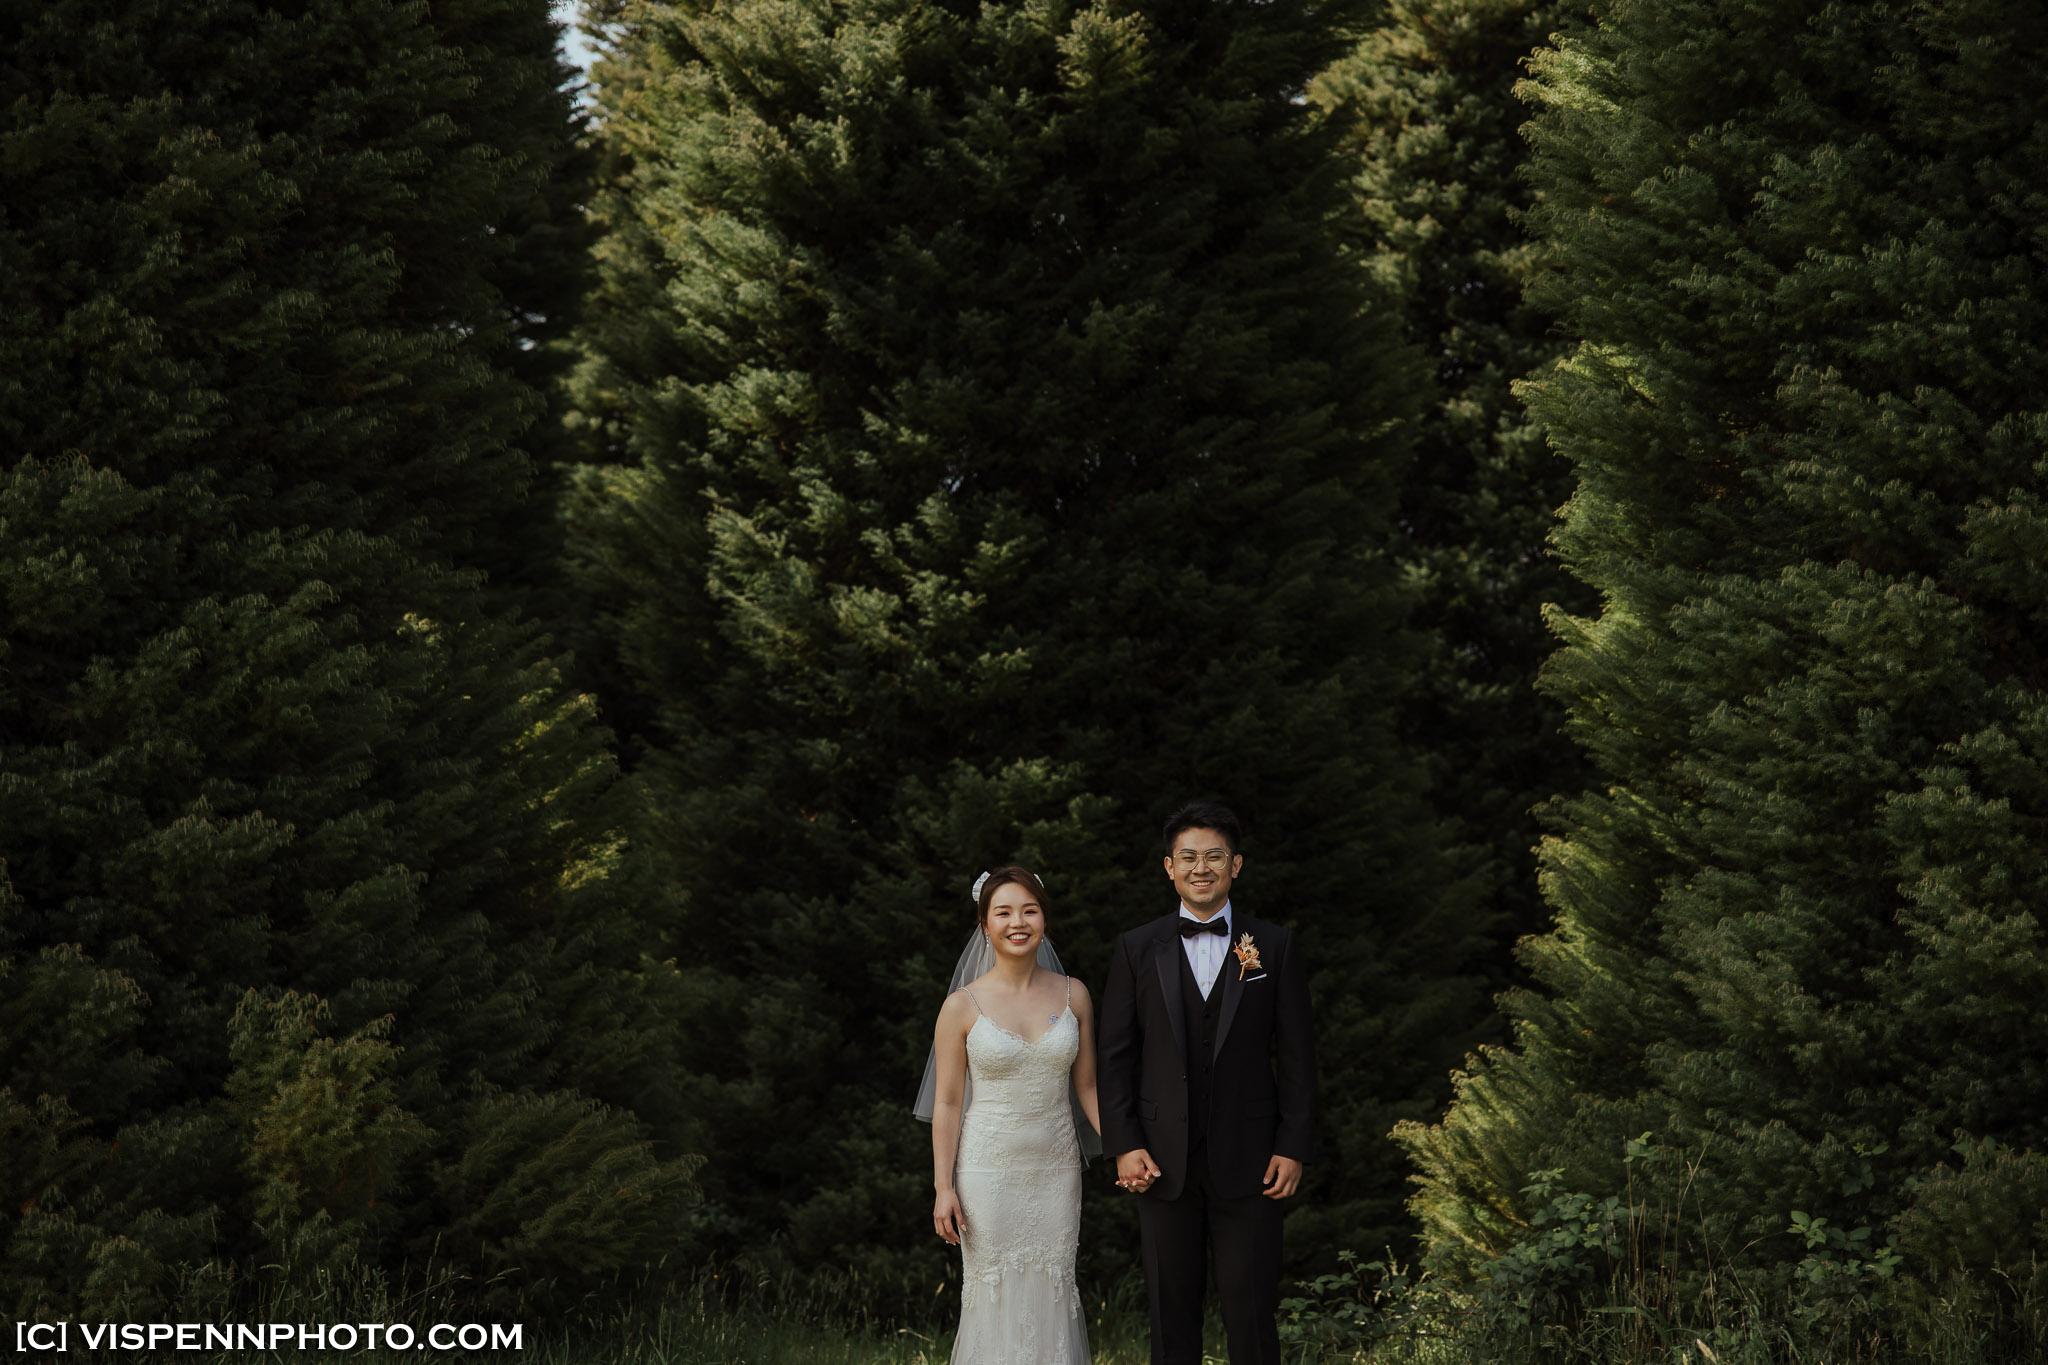 WEDDING DAY Photography Melbourne VISPENN 墨尔本 婚礼跟拍 婚礼摄像 婚礼摄影 结婚照 登记照 ElitaPB 06722 1P EOSR VISPENN